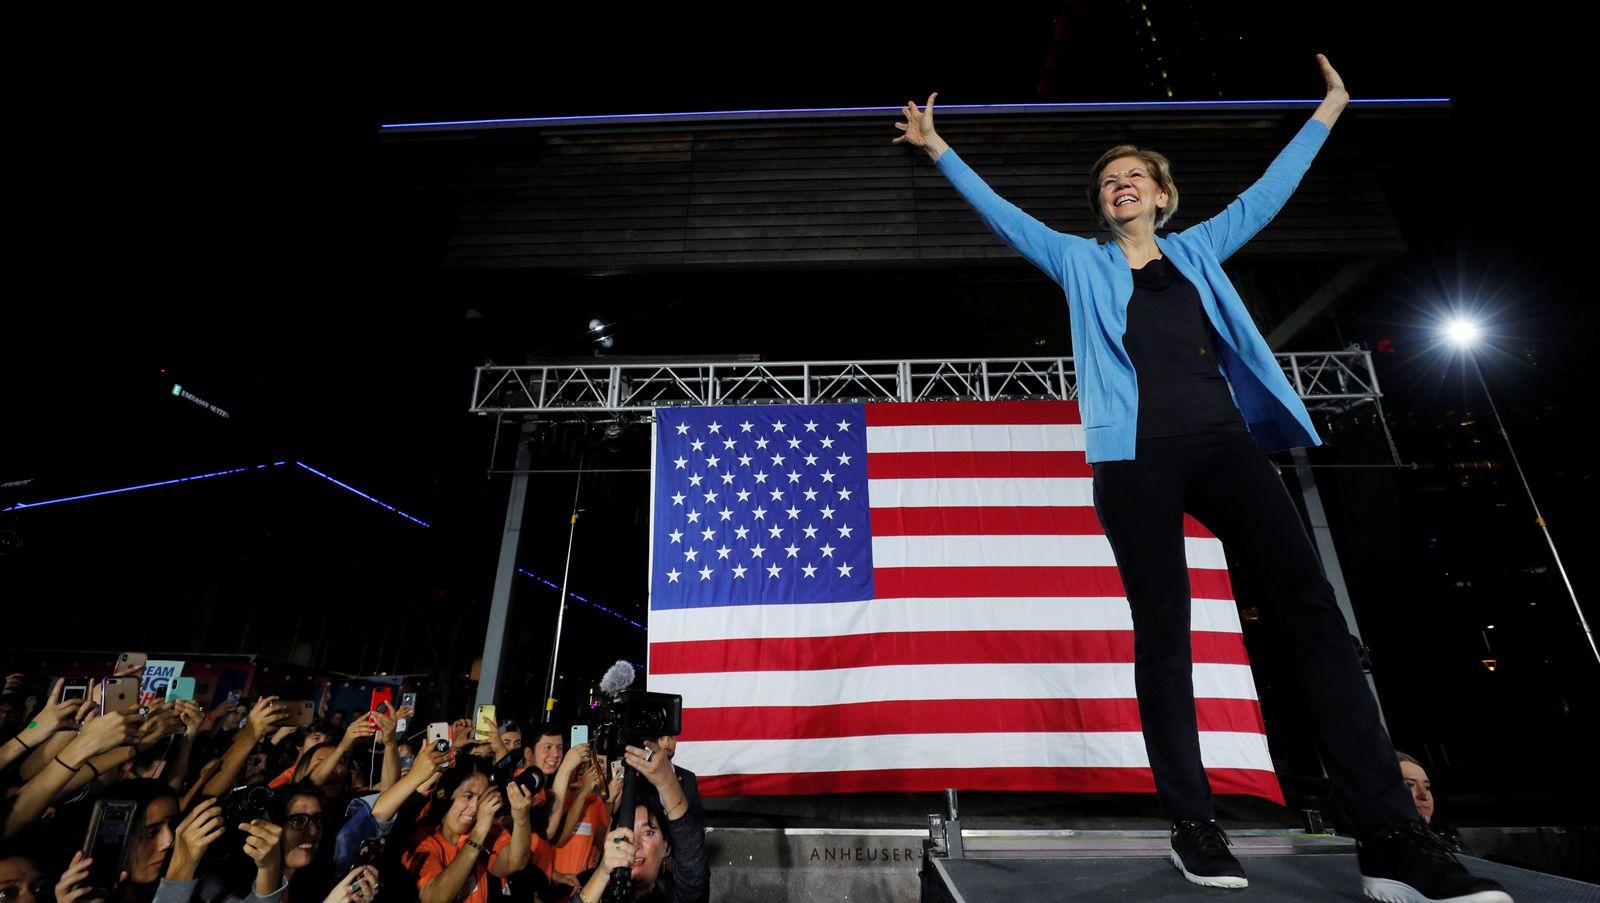 Democratic 2020 U.S. presidential candidate Warren campaigns in Houston